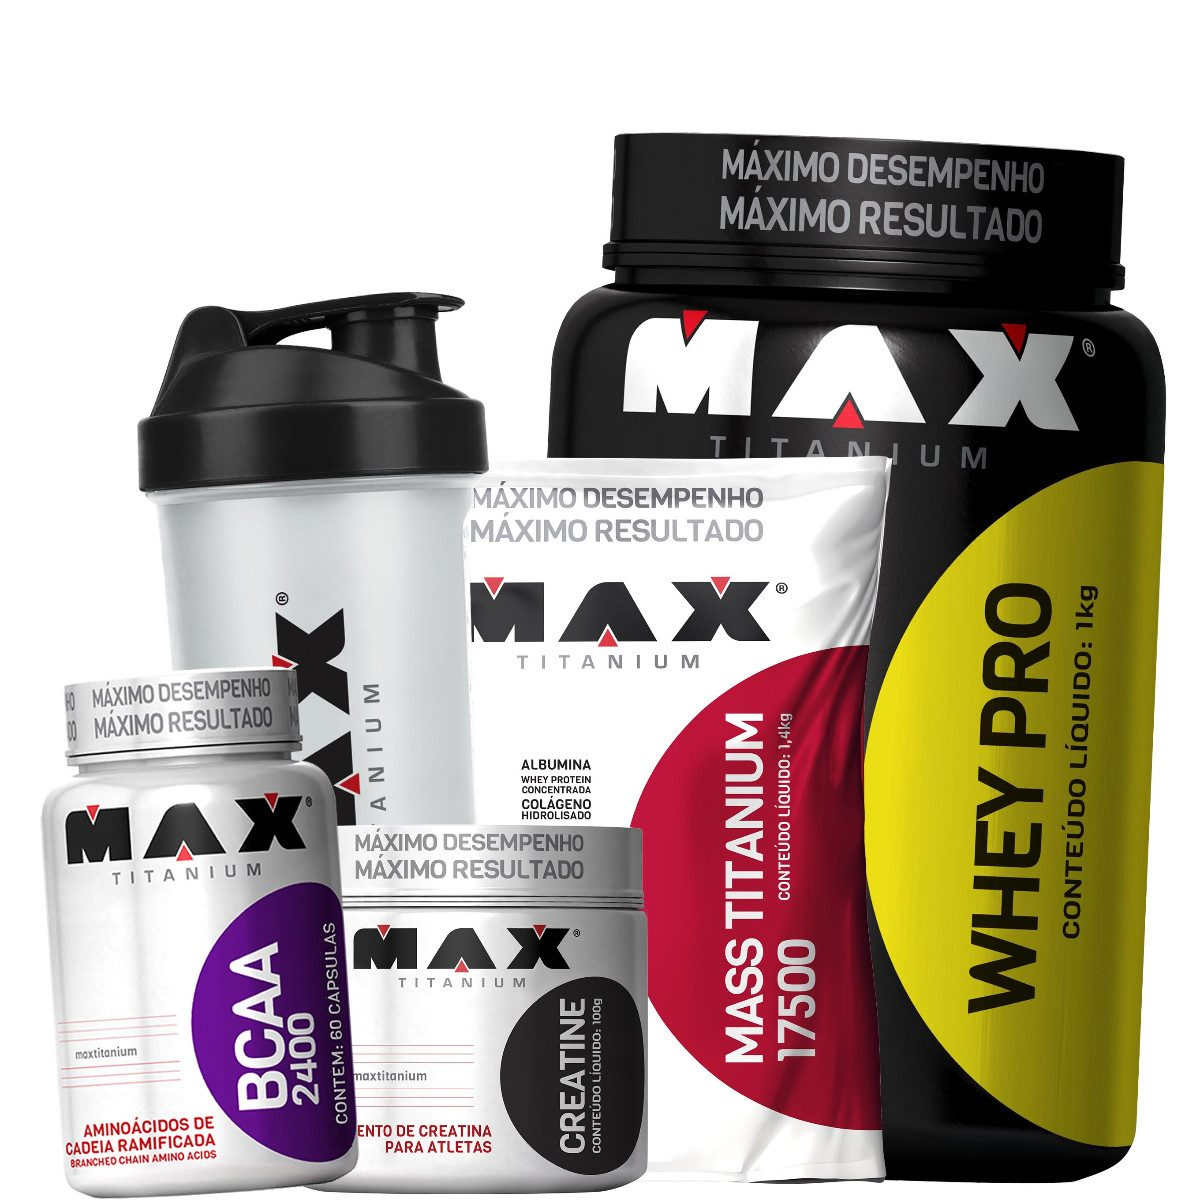 9135cdb64 Kit Ganho De Massa Muscular Max Titanium - R  99